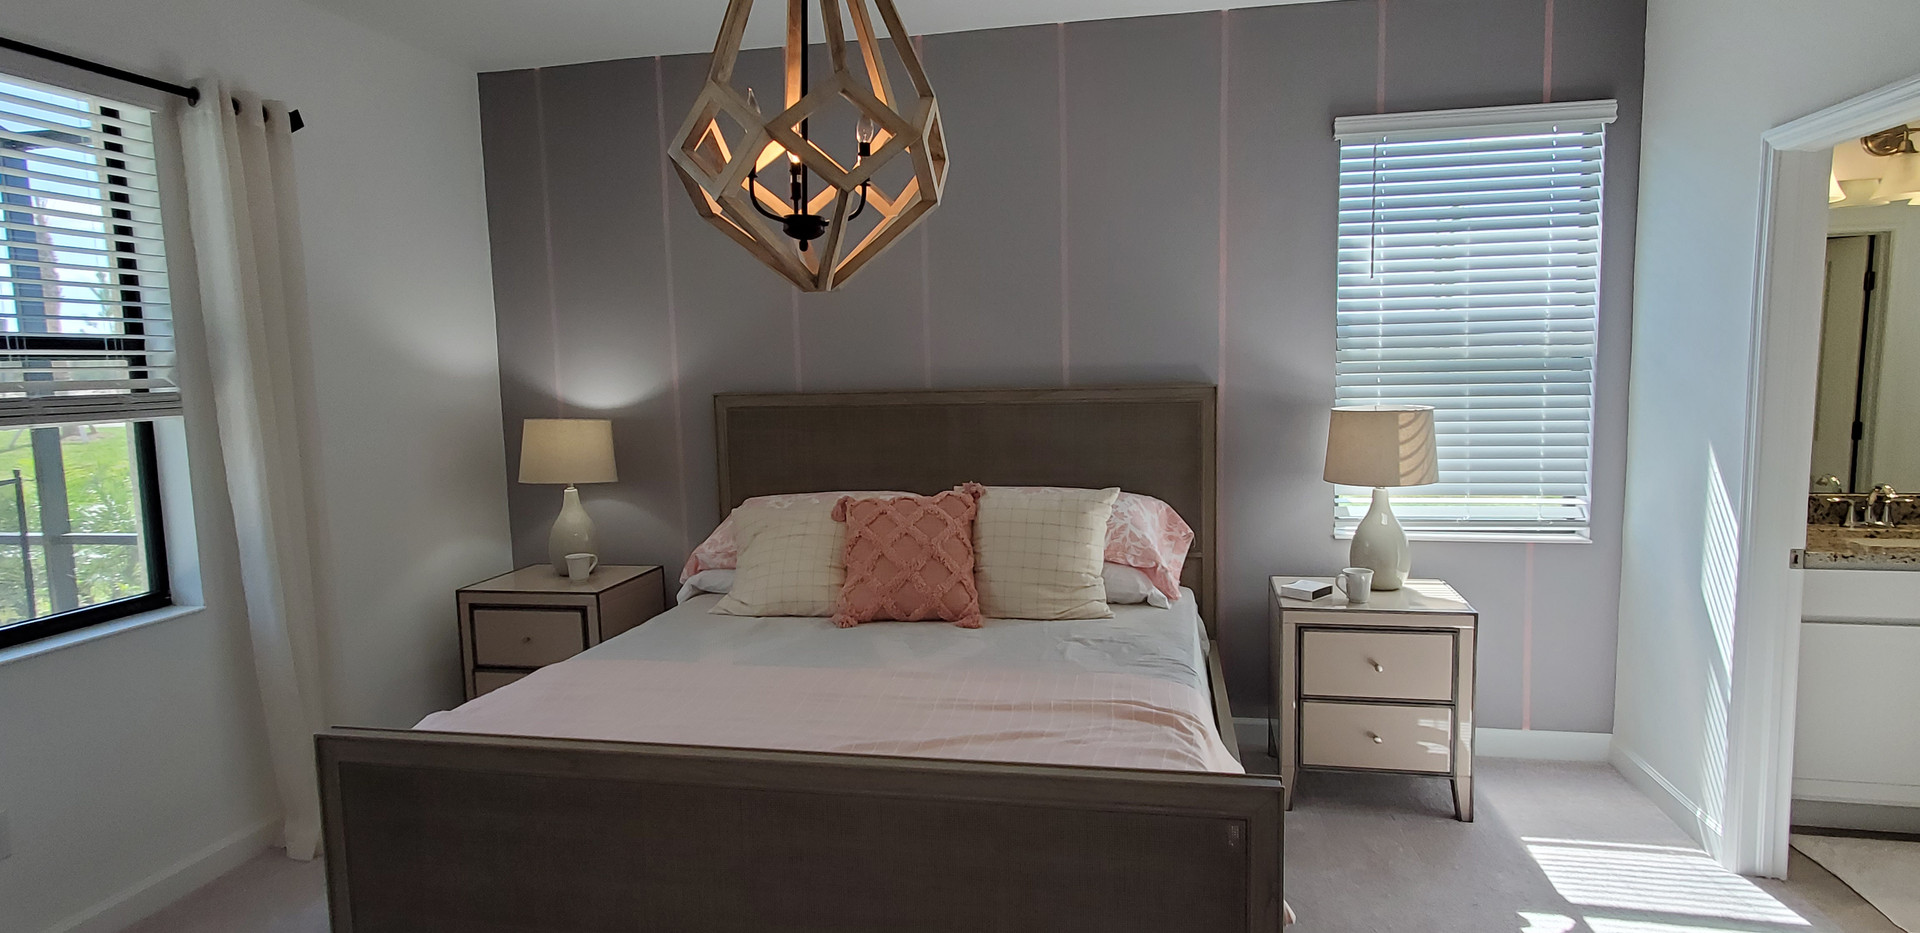 Lorraine Lakes Lakewood Ranch Trevi model home bedroom